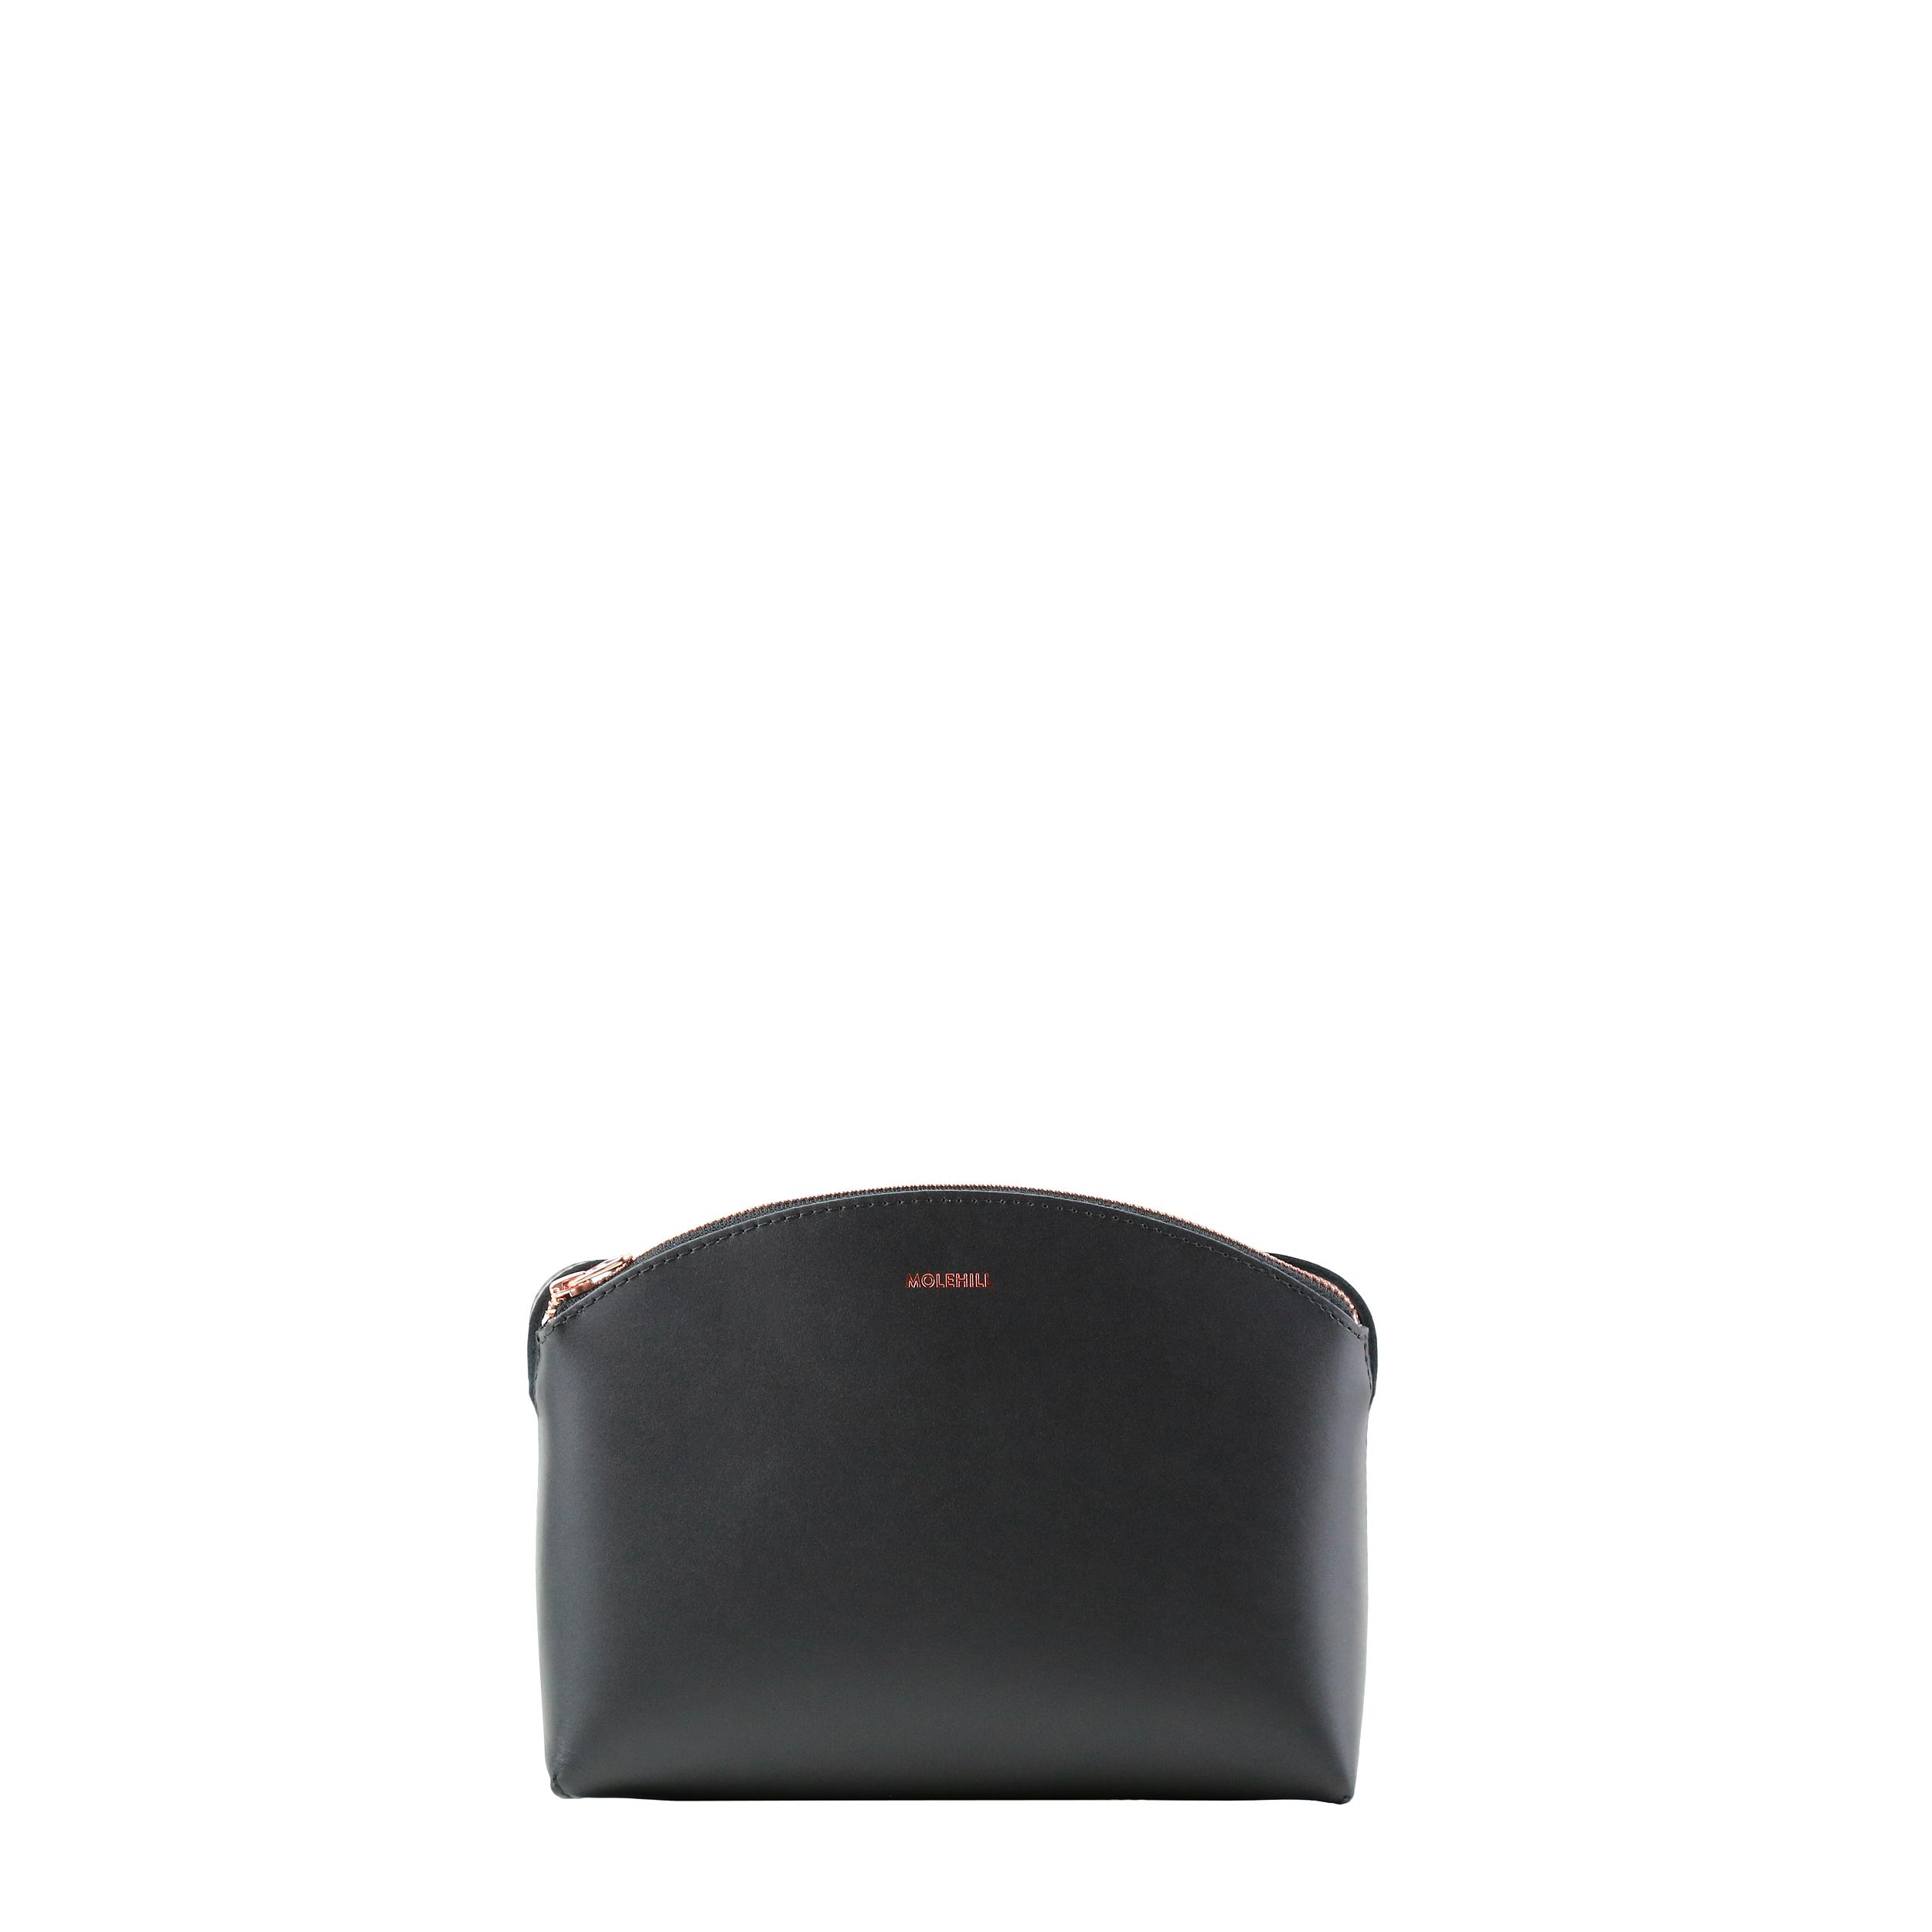 TIMI-Crossbody-Bag-Black-1